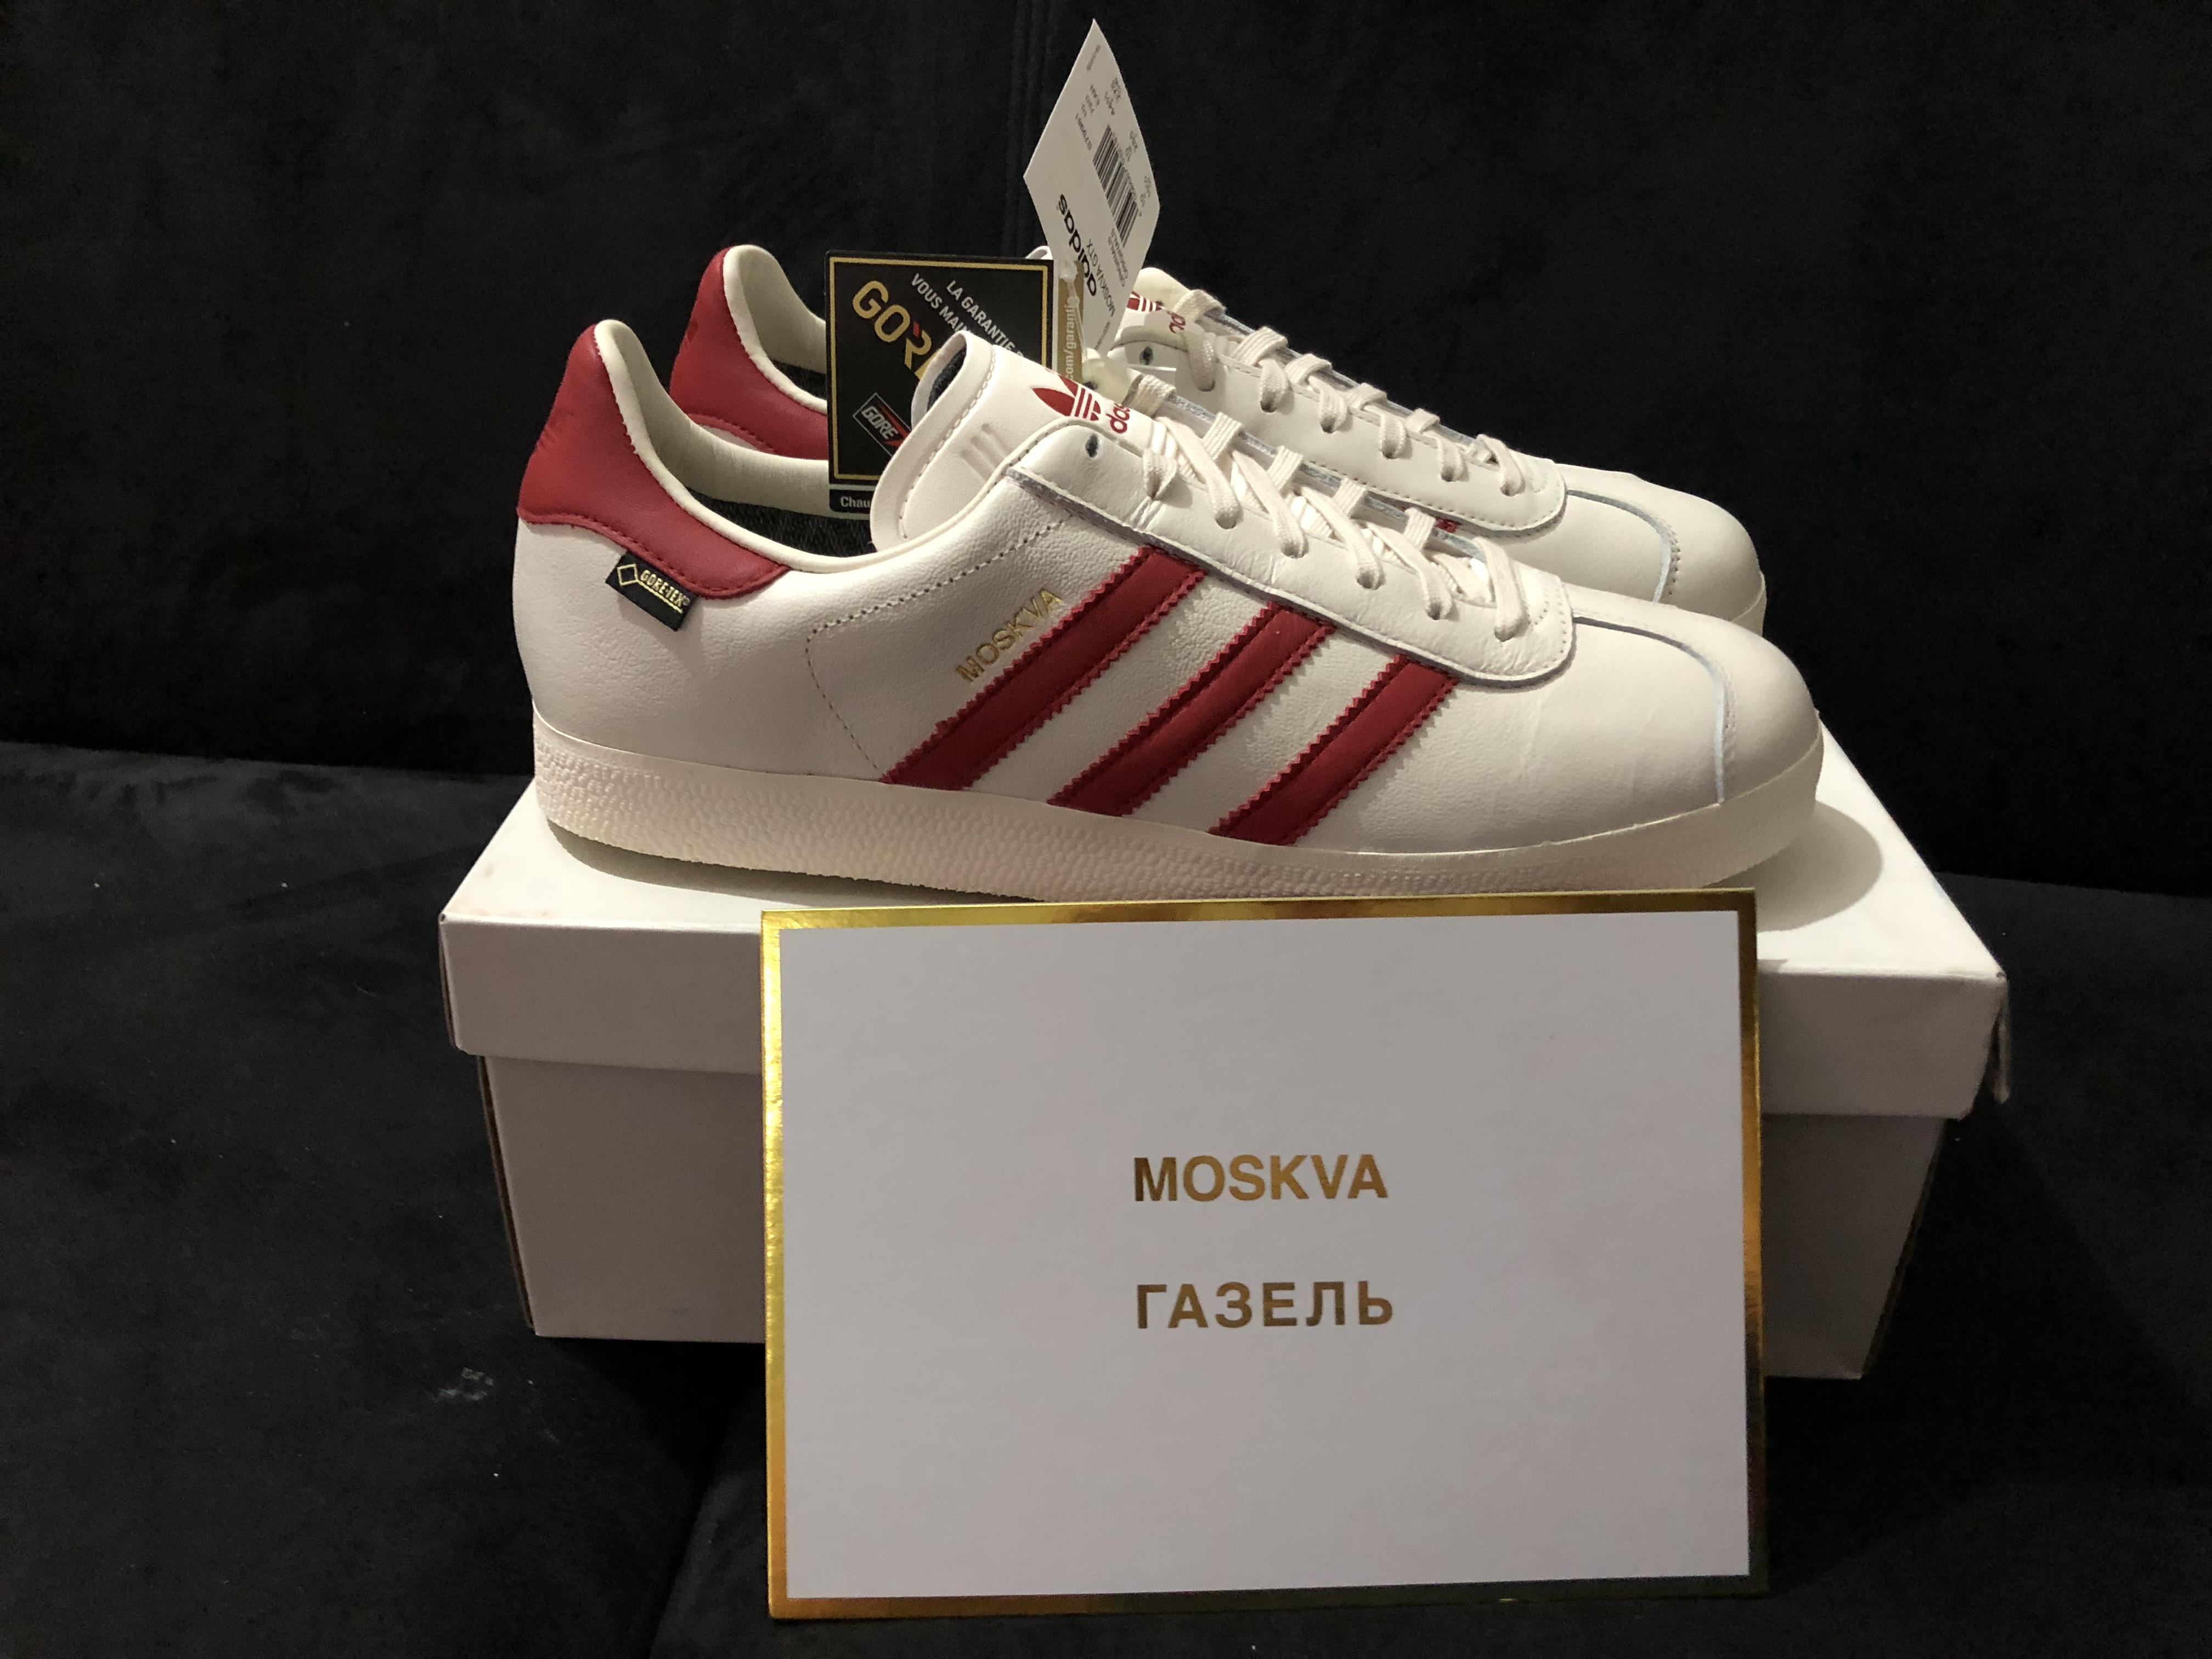 adidas gazelle moskva gtx size 10.5 US